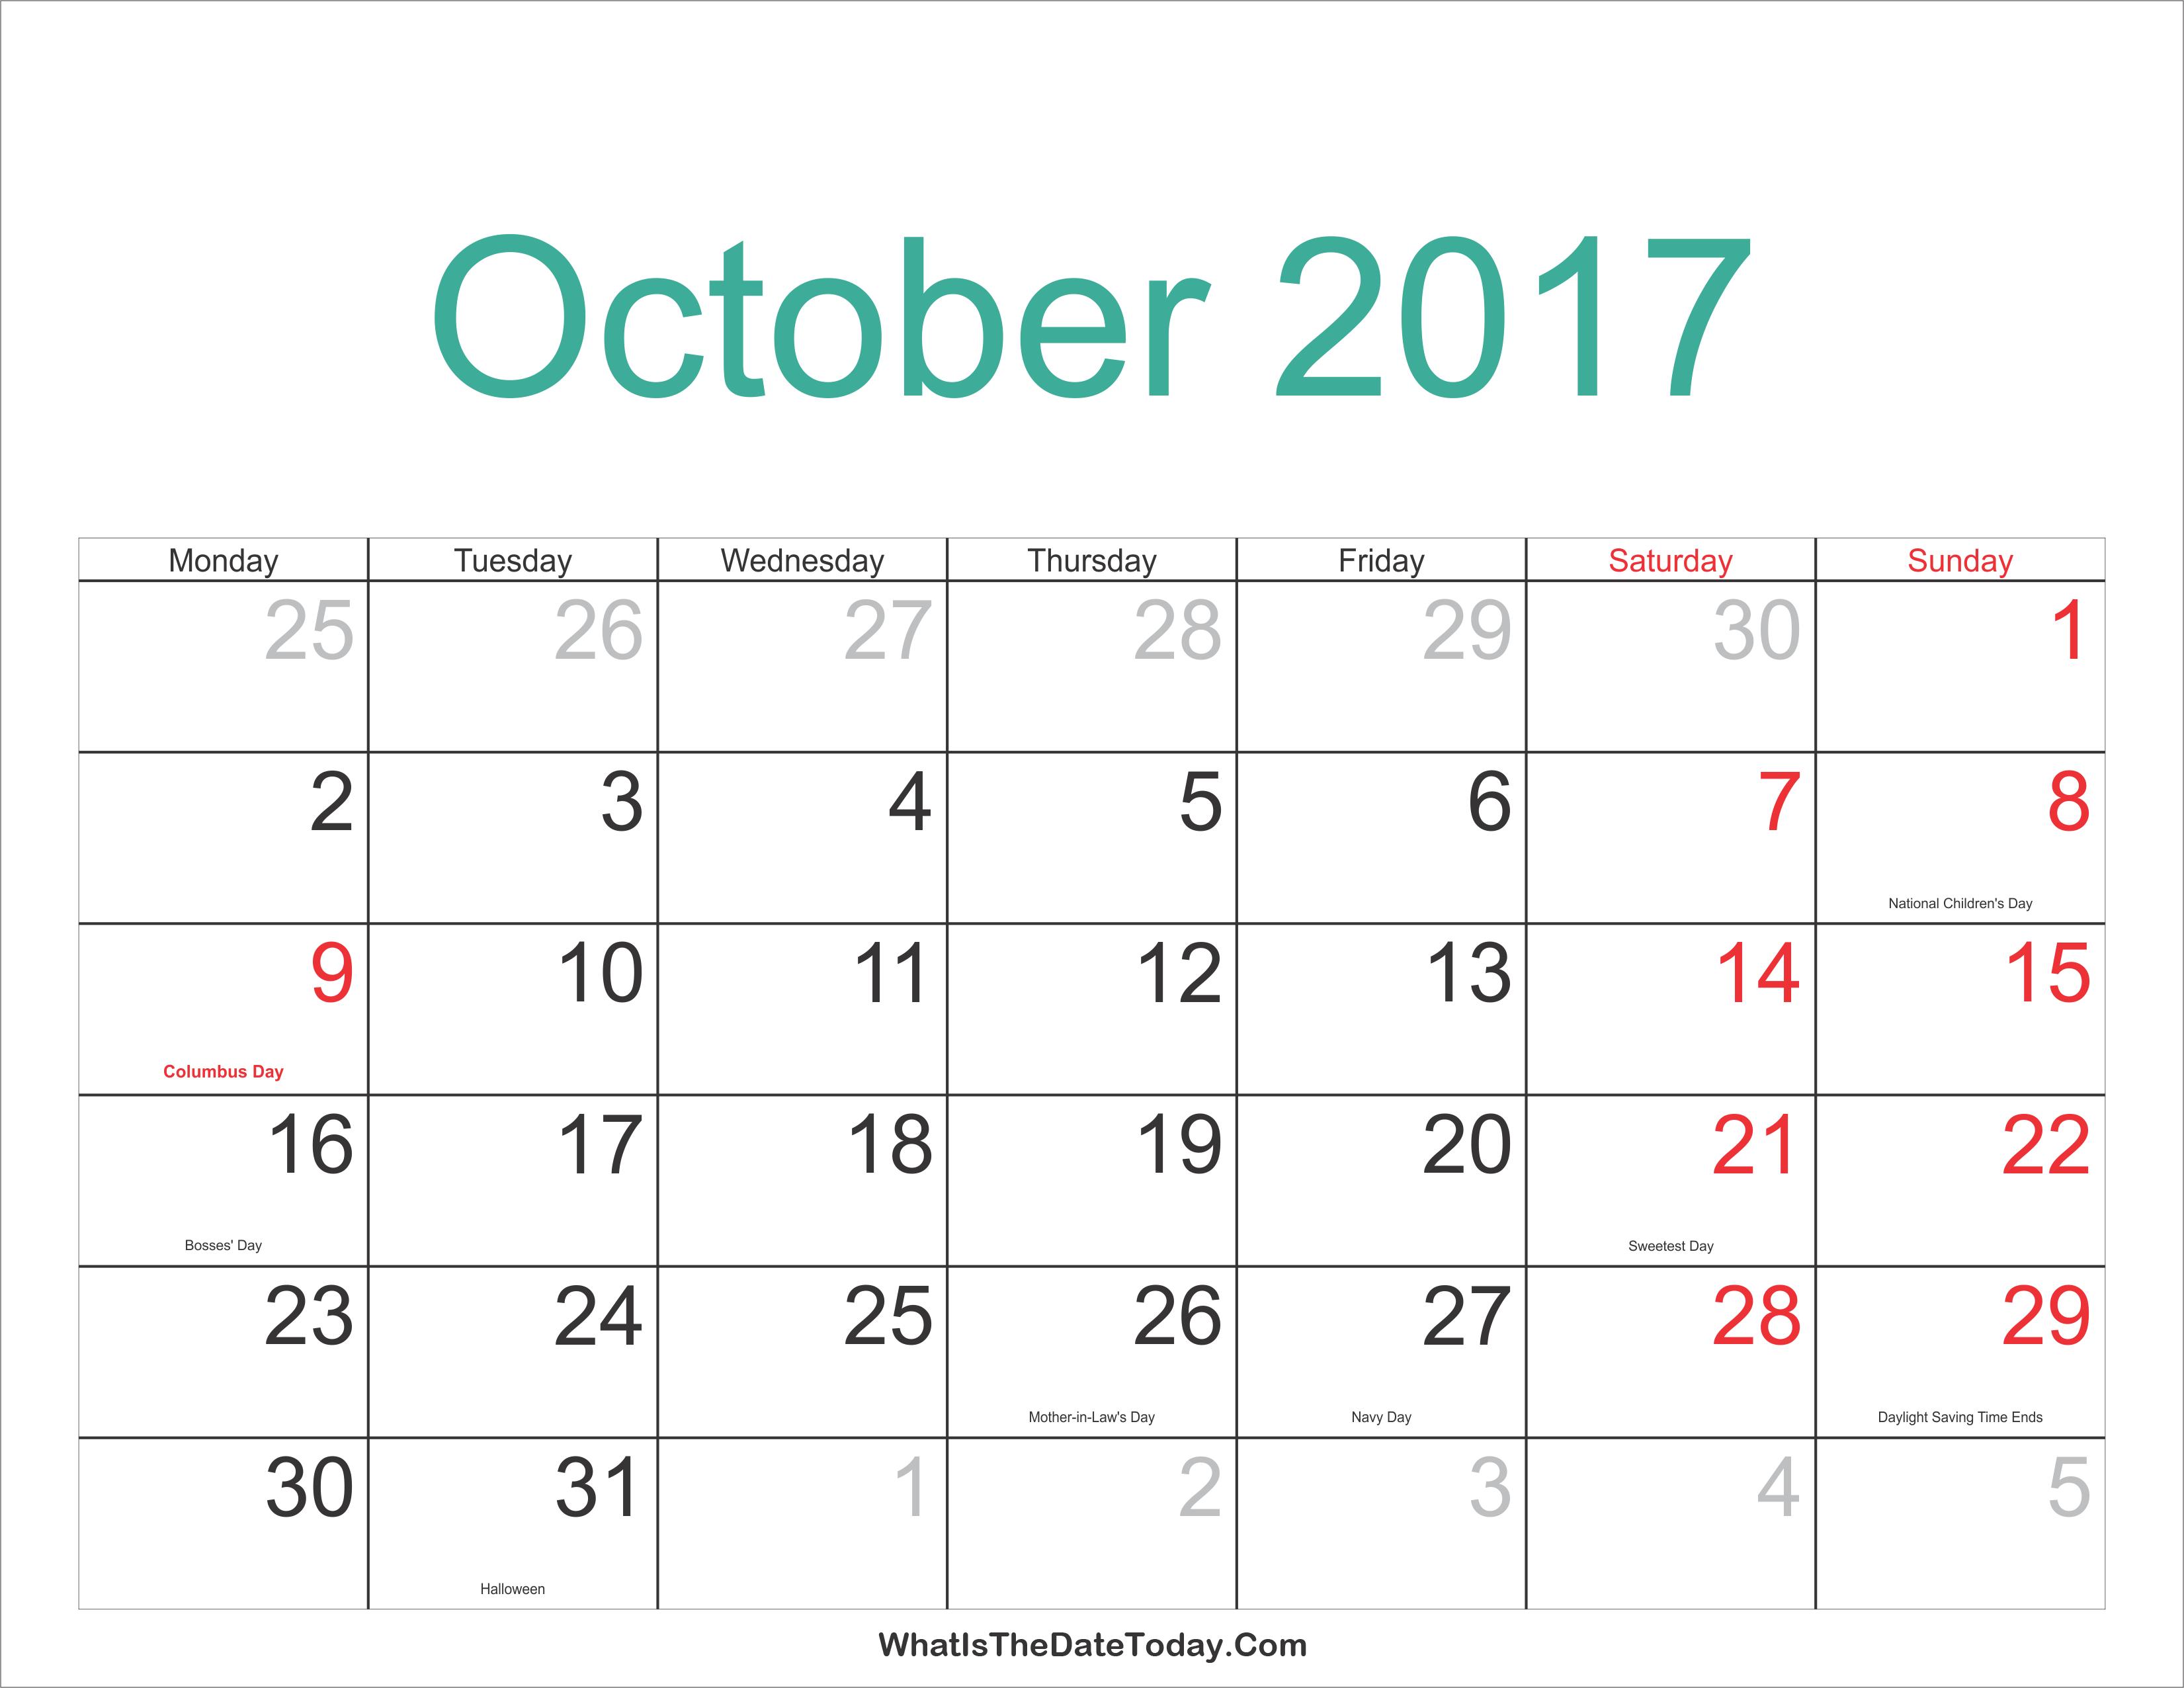 October 2017 Calendar Printable with Holidays | Whatisthedatetoday.Com